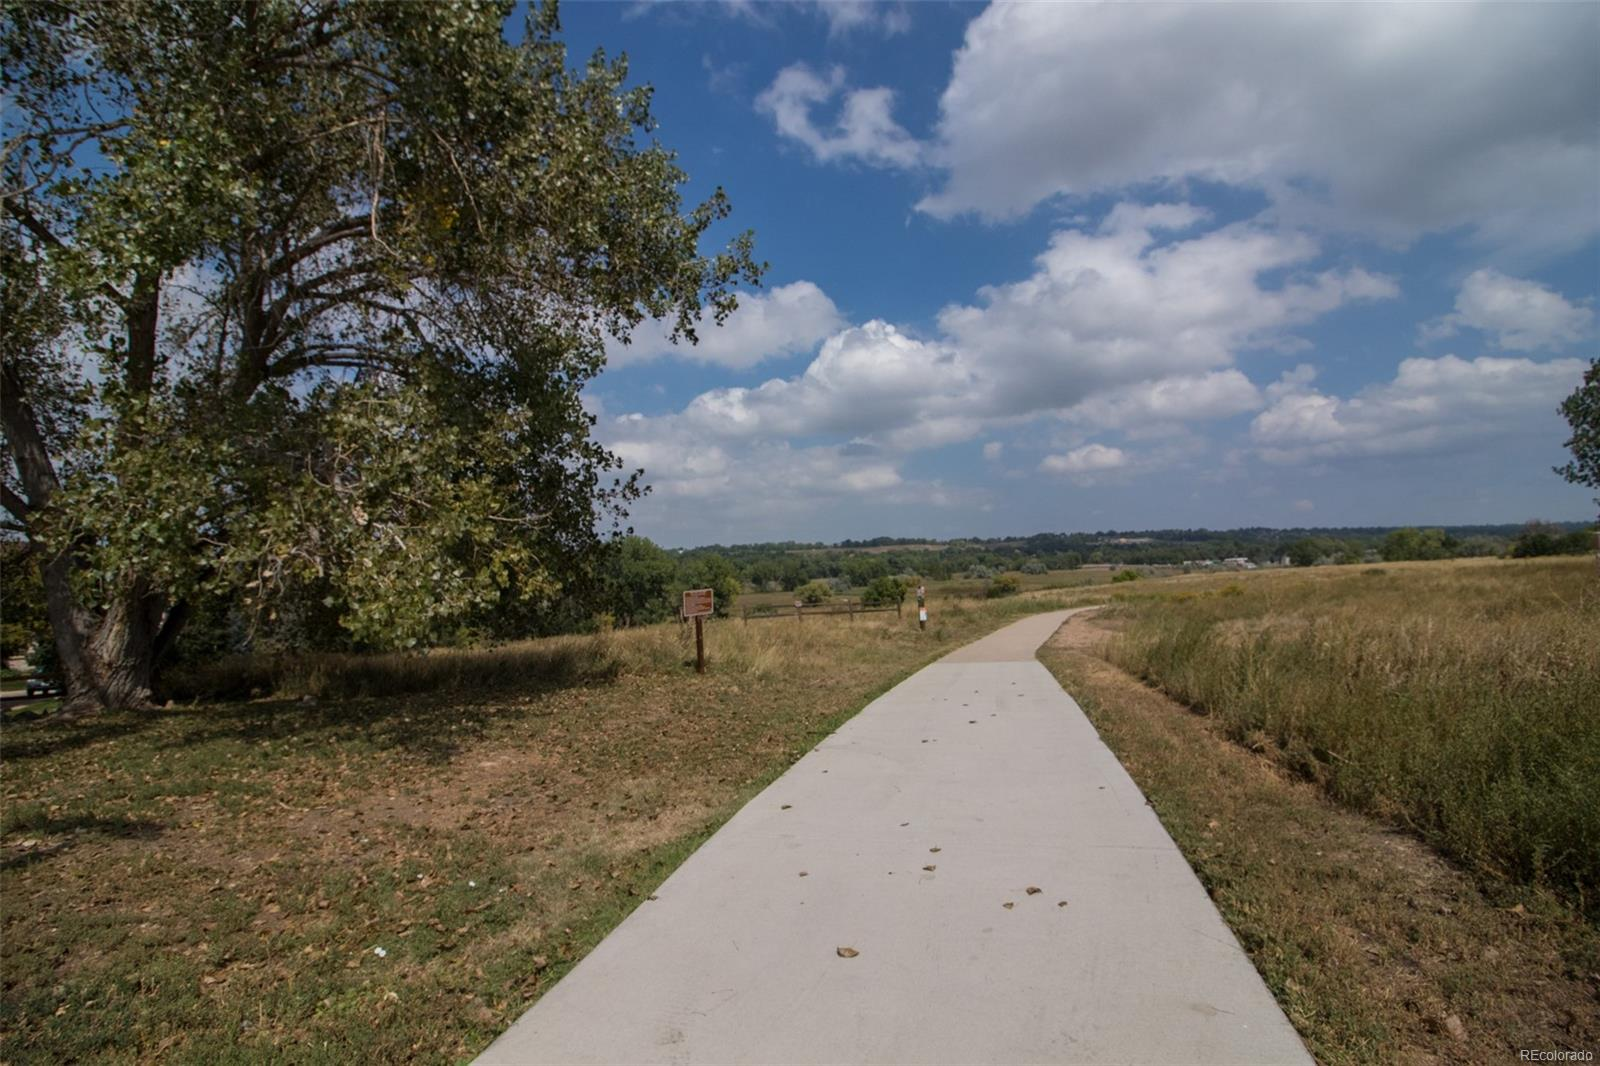 Enjoying walks, bike rides or runs along the Bear Creek Greenbelt